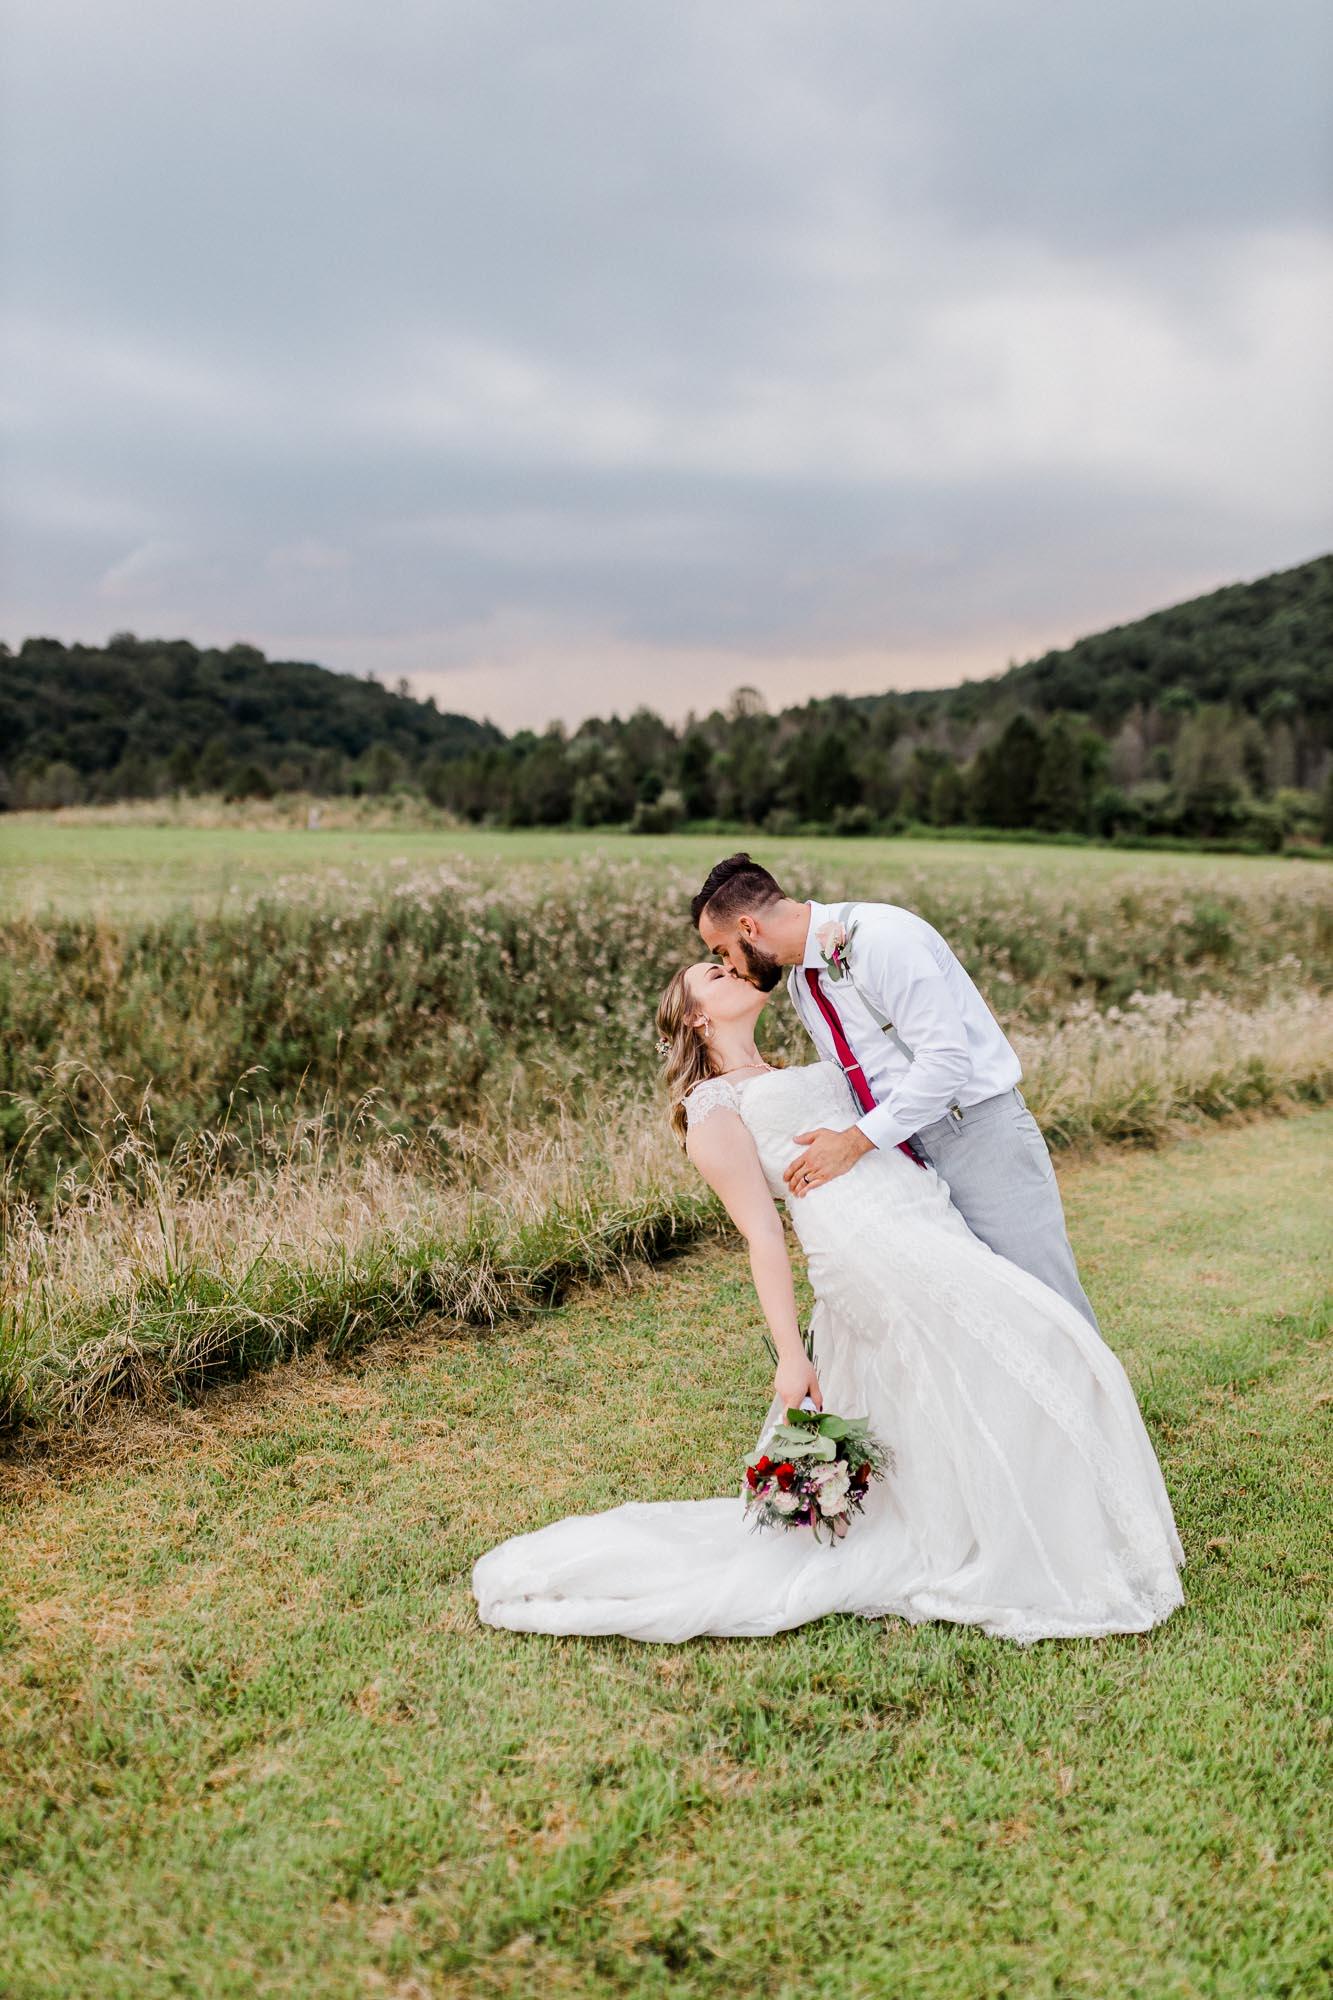 Stillwater-Christian_Church_Wedding-2401.jpg